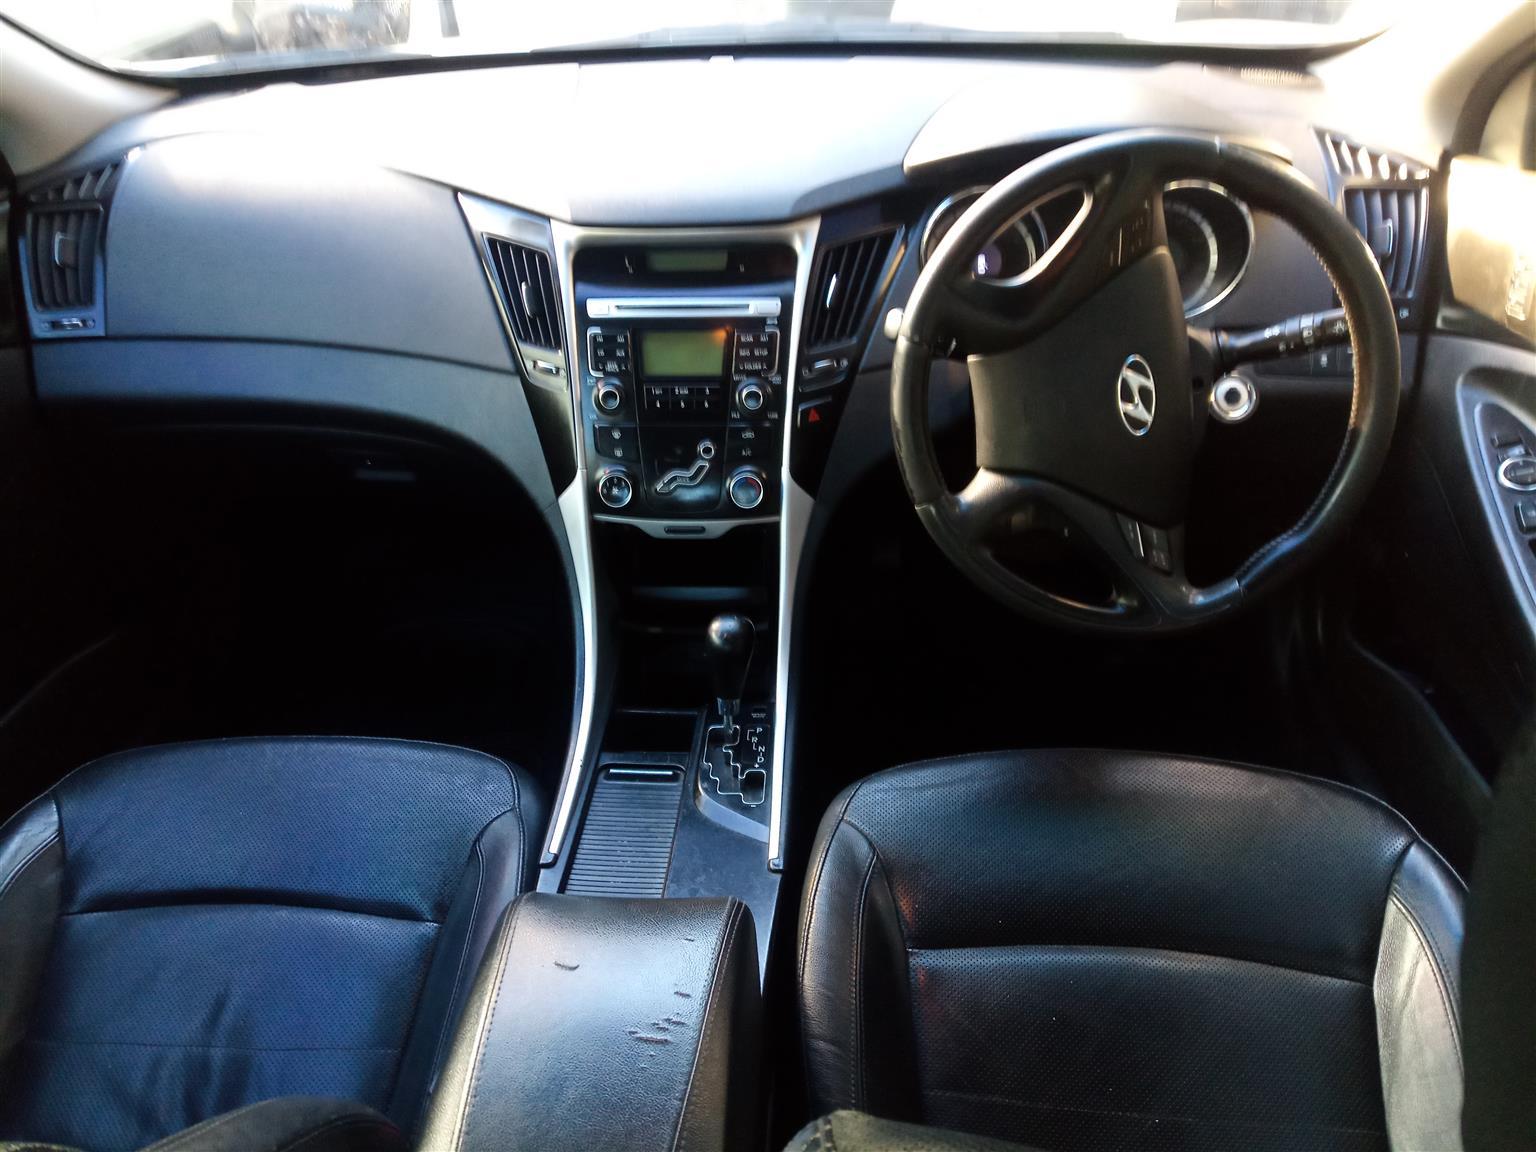 2010 Hyundai Sonata 2.4 GLS automatic